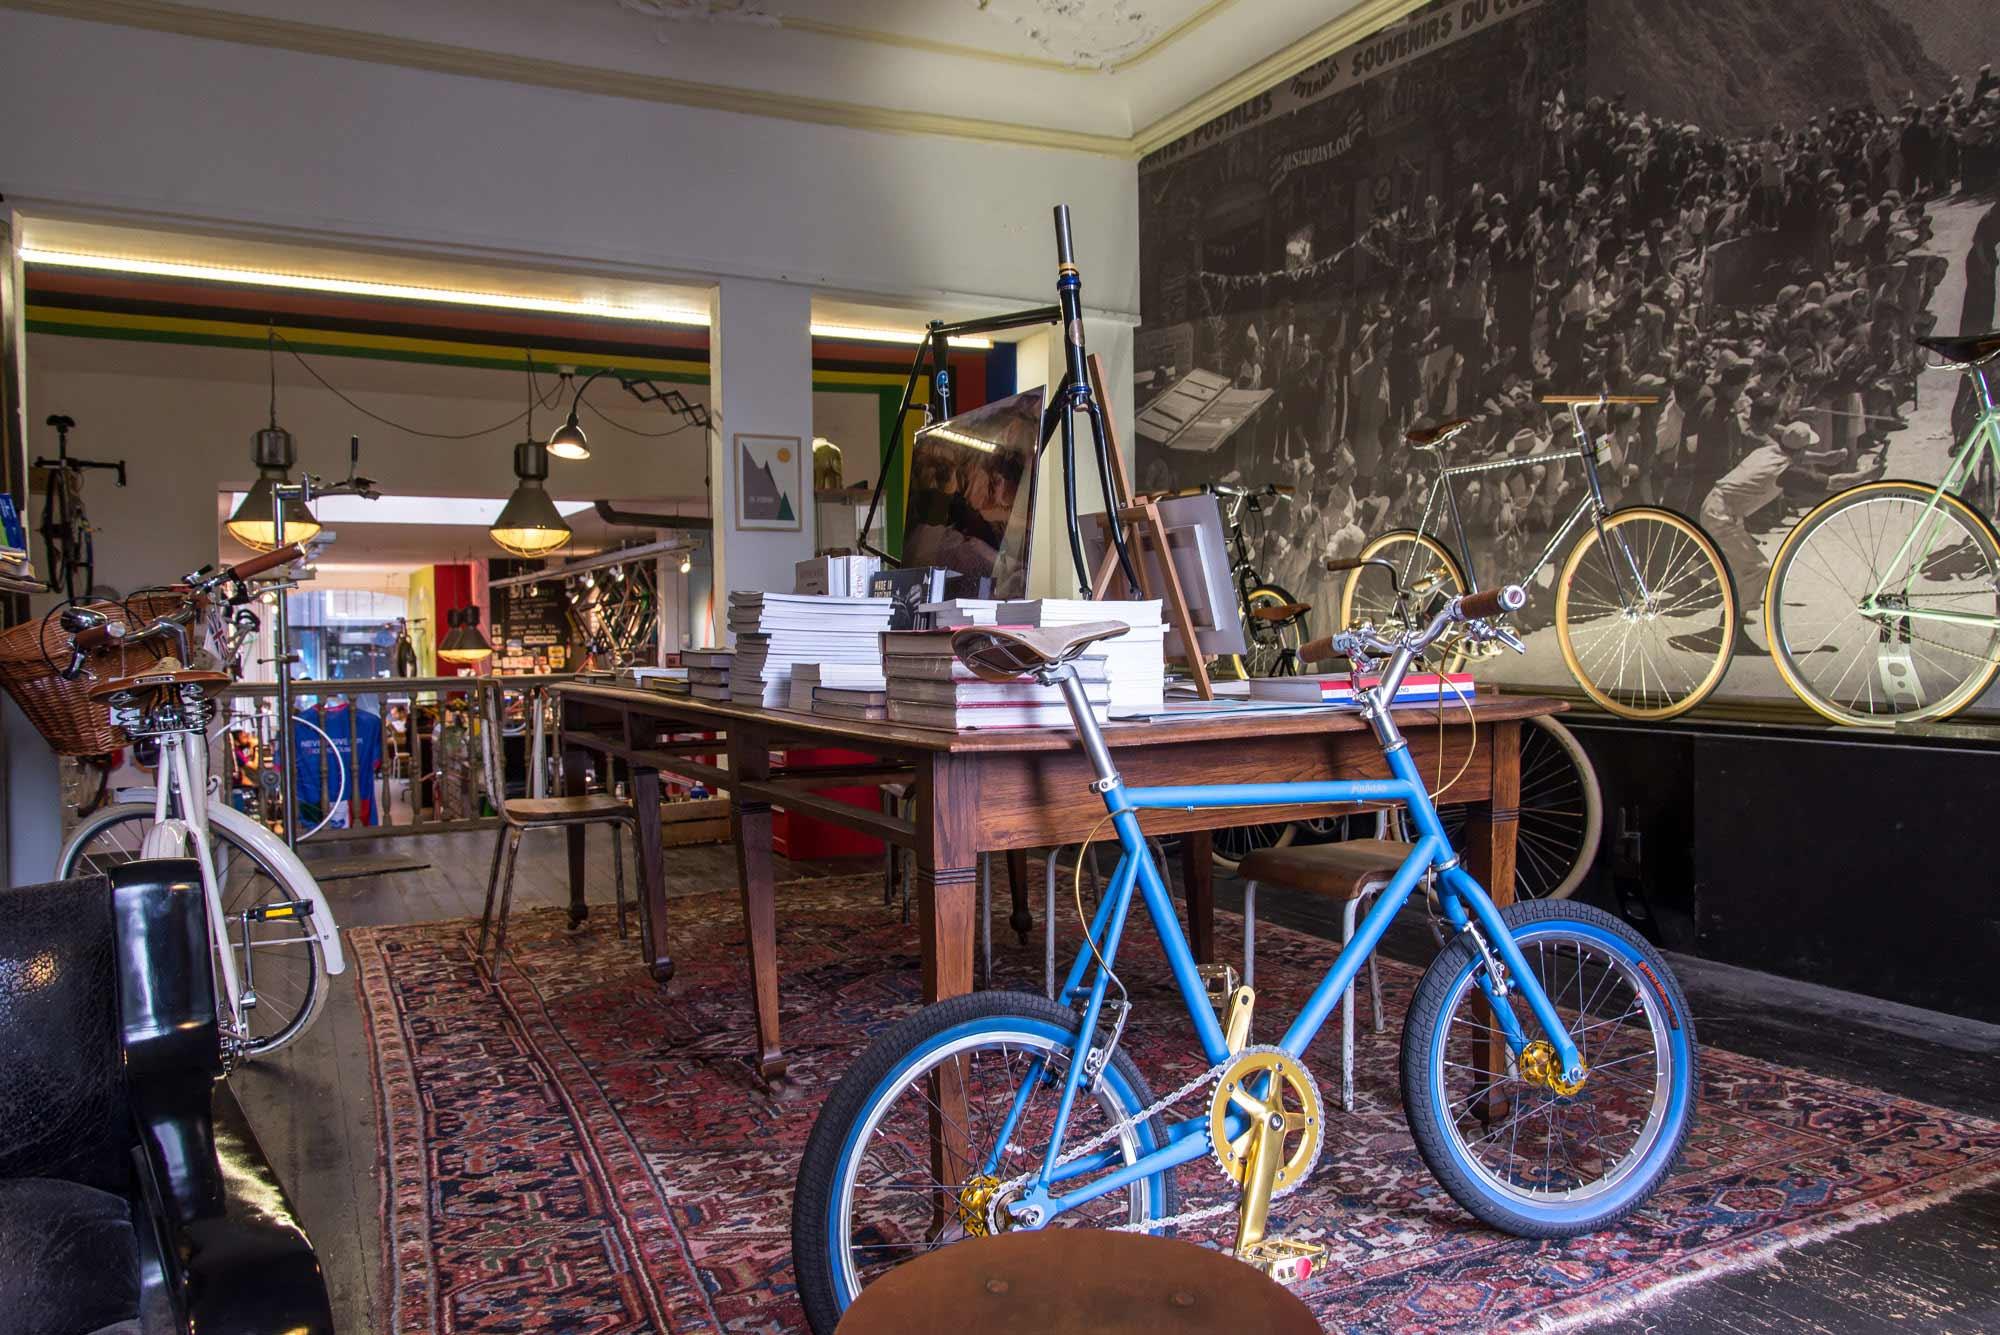 blauwe fiets